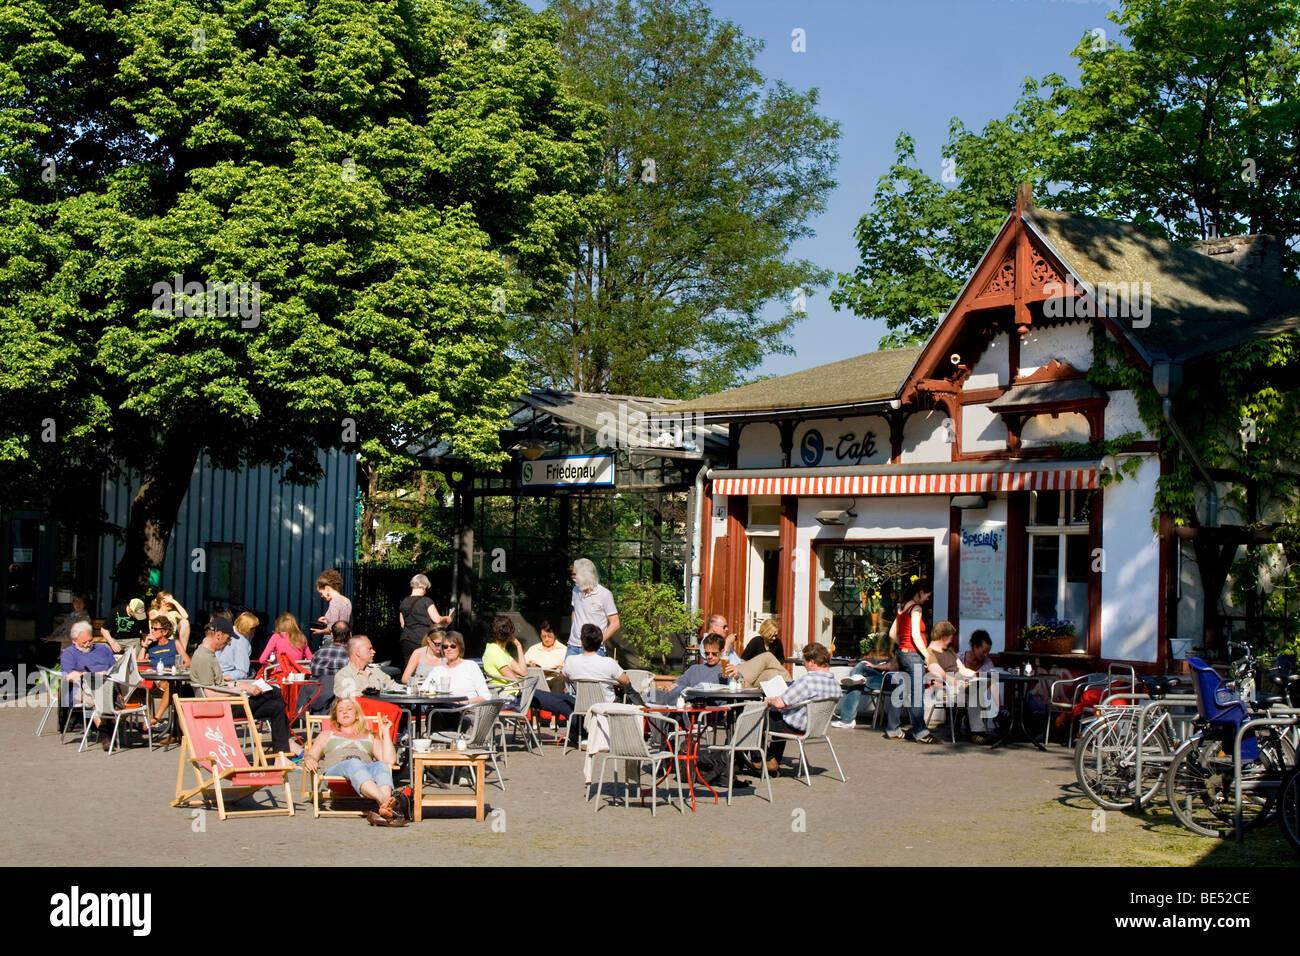 S Cafe Friedenau